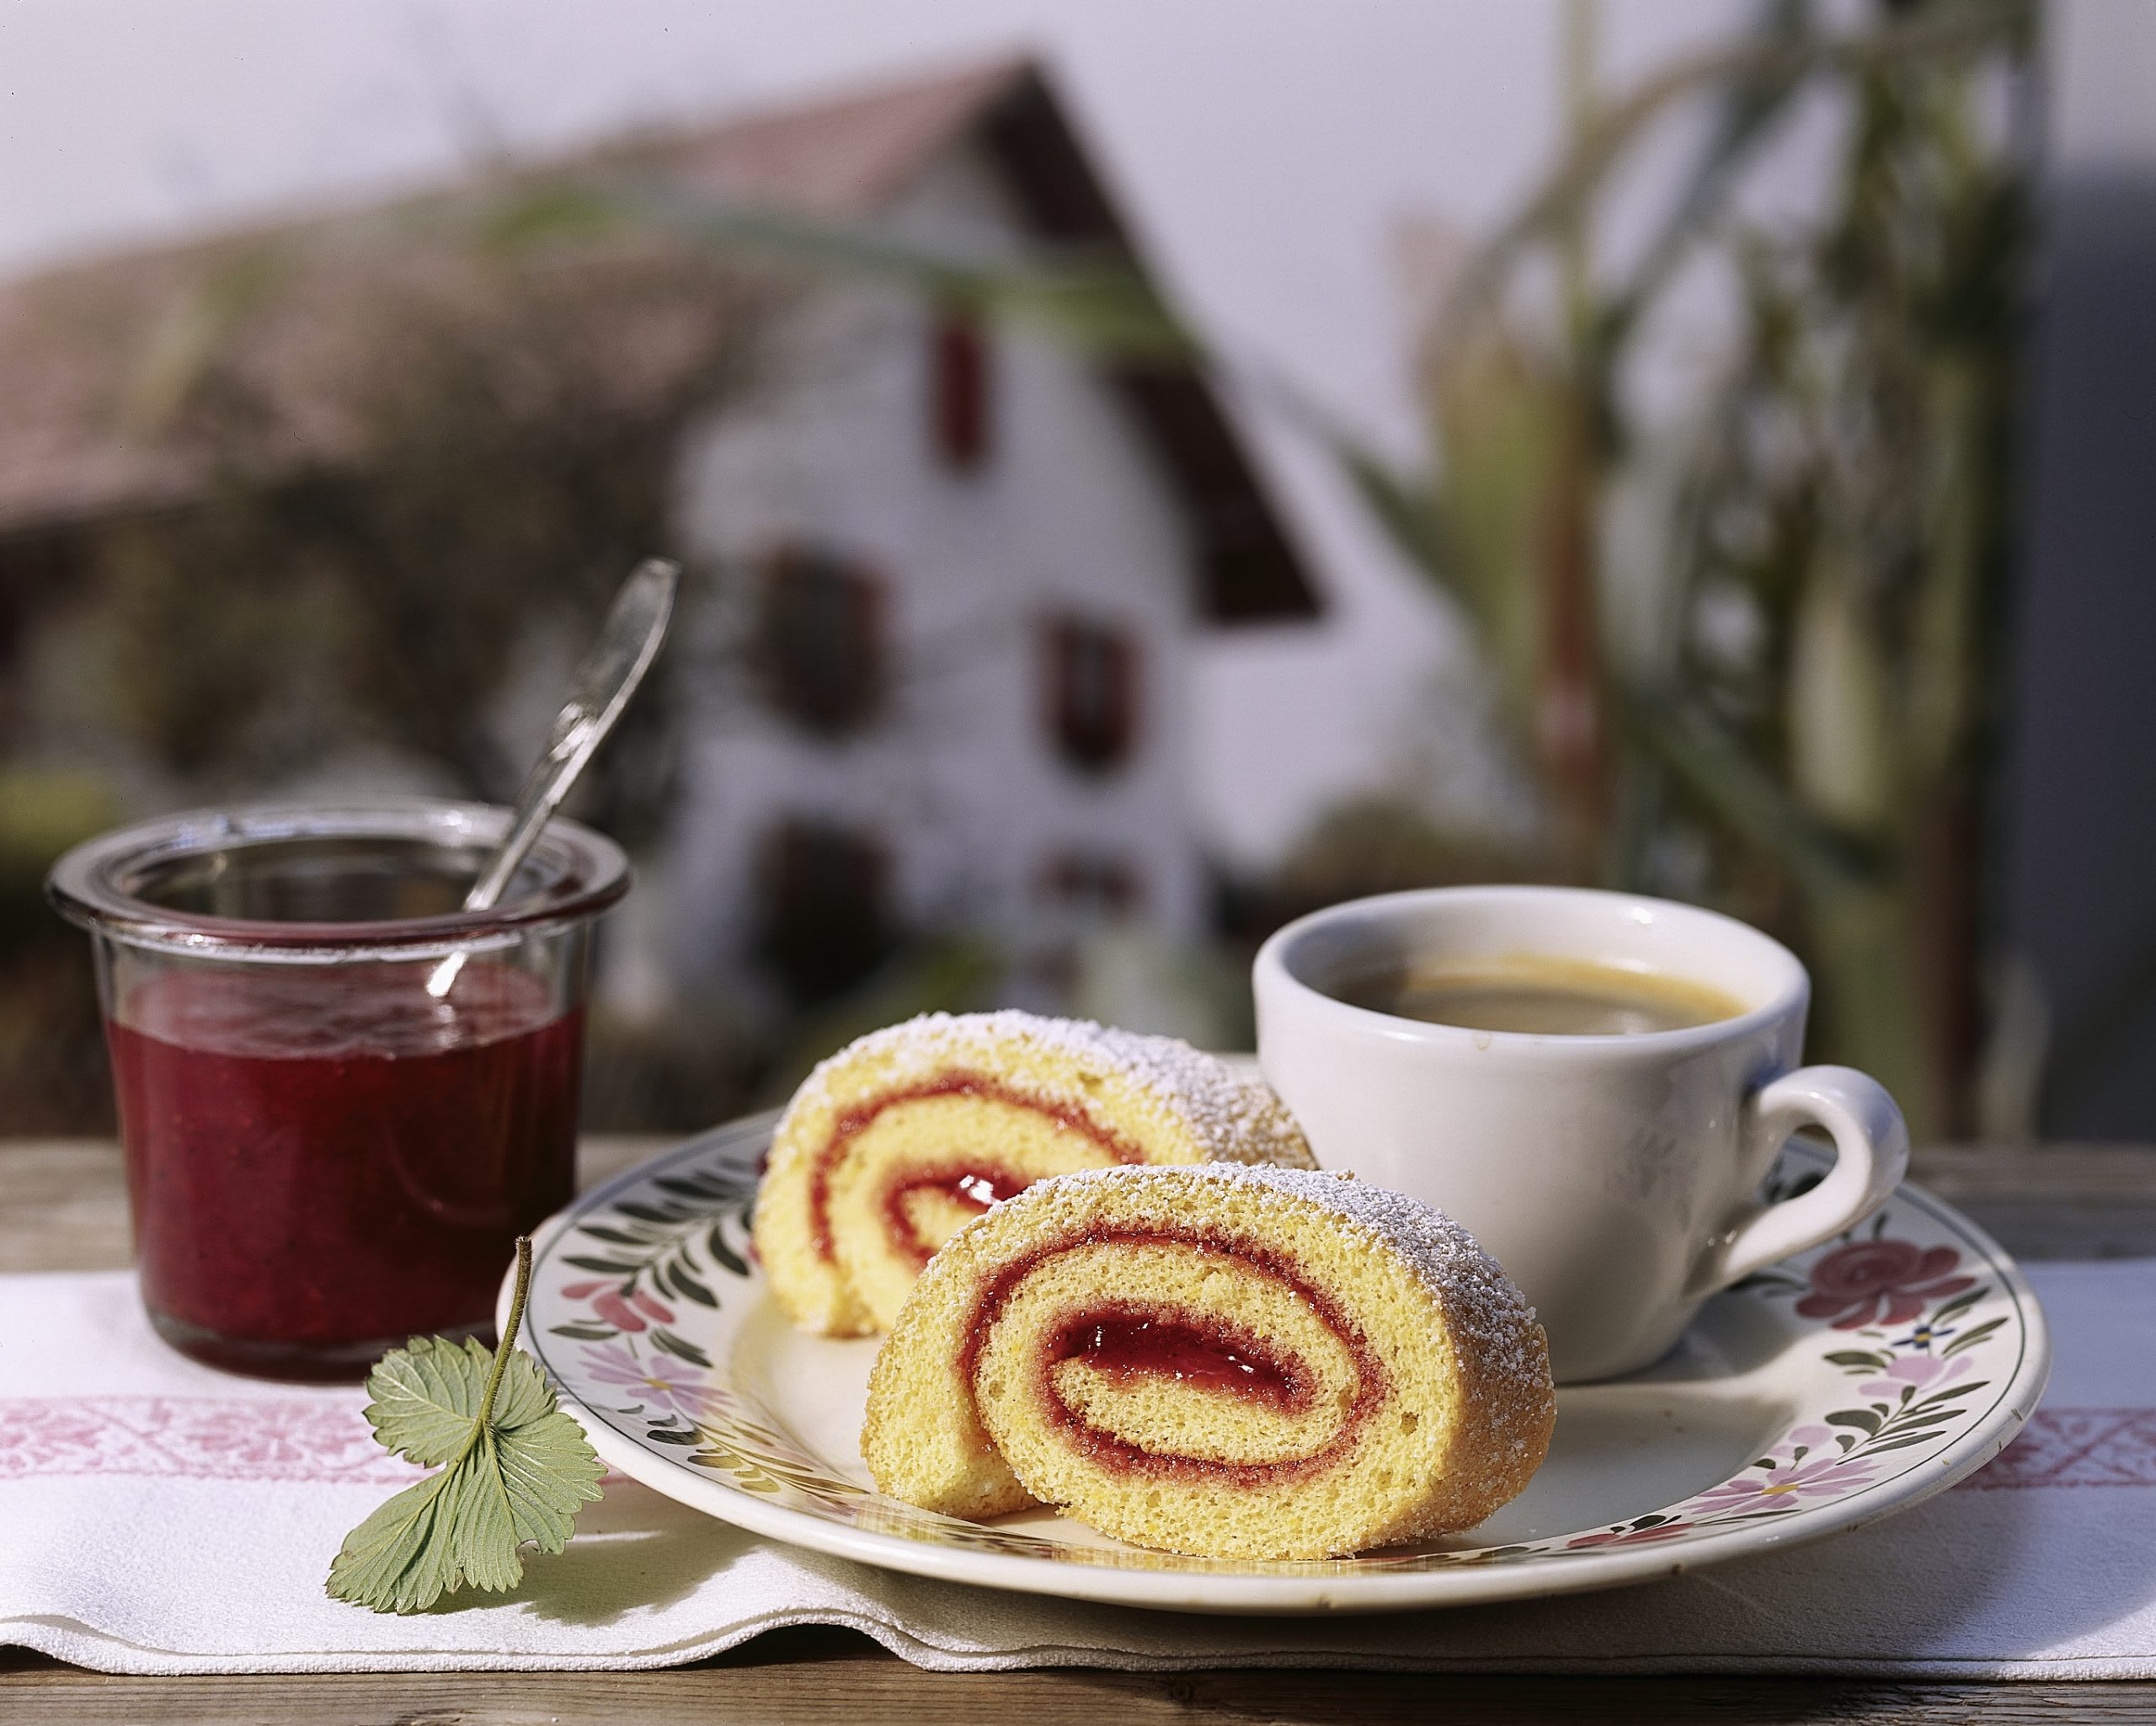 Biskuitroulade mit Erdbeer-Rhabarber-Konfitüre